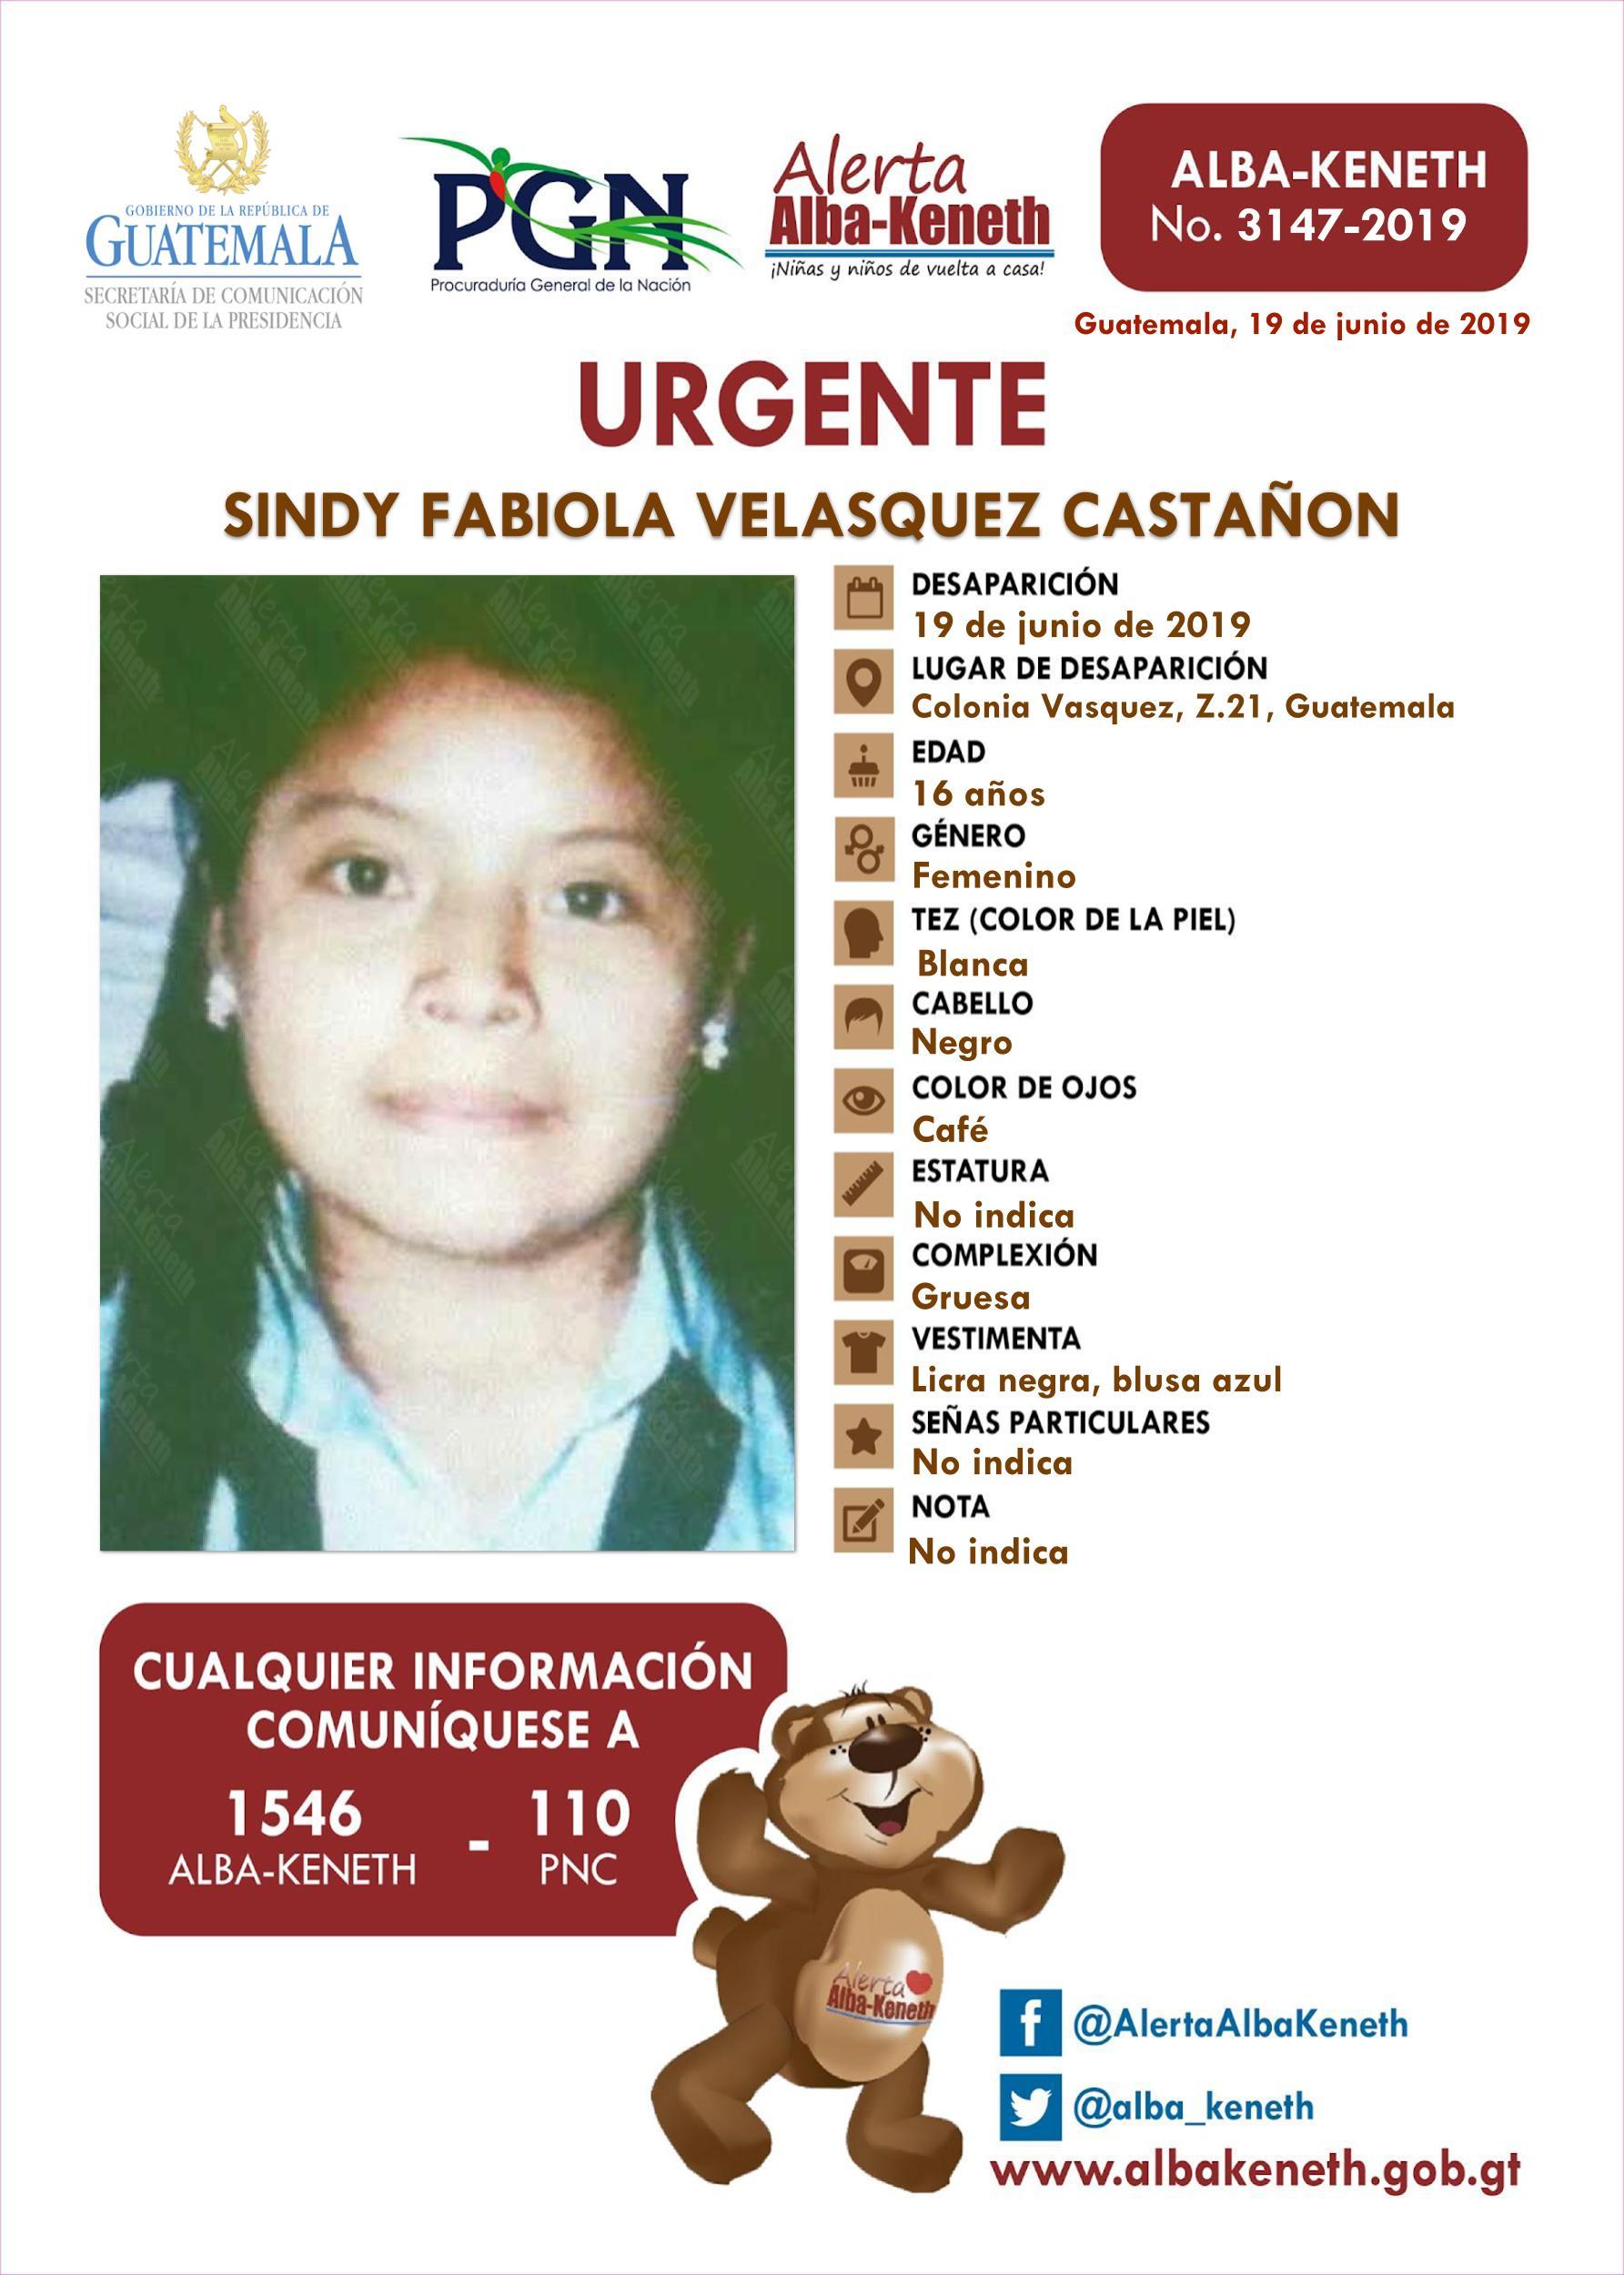 Sindy Fabiola Velasquez Castañon